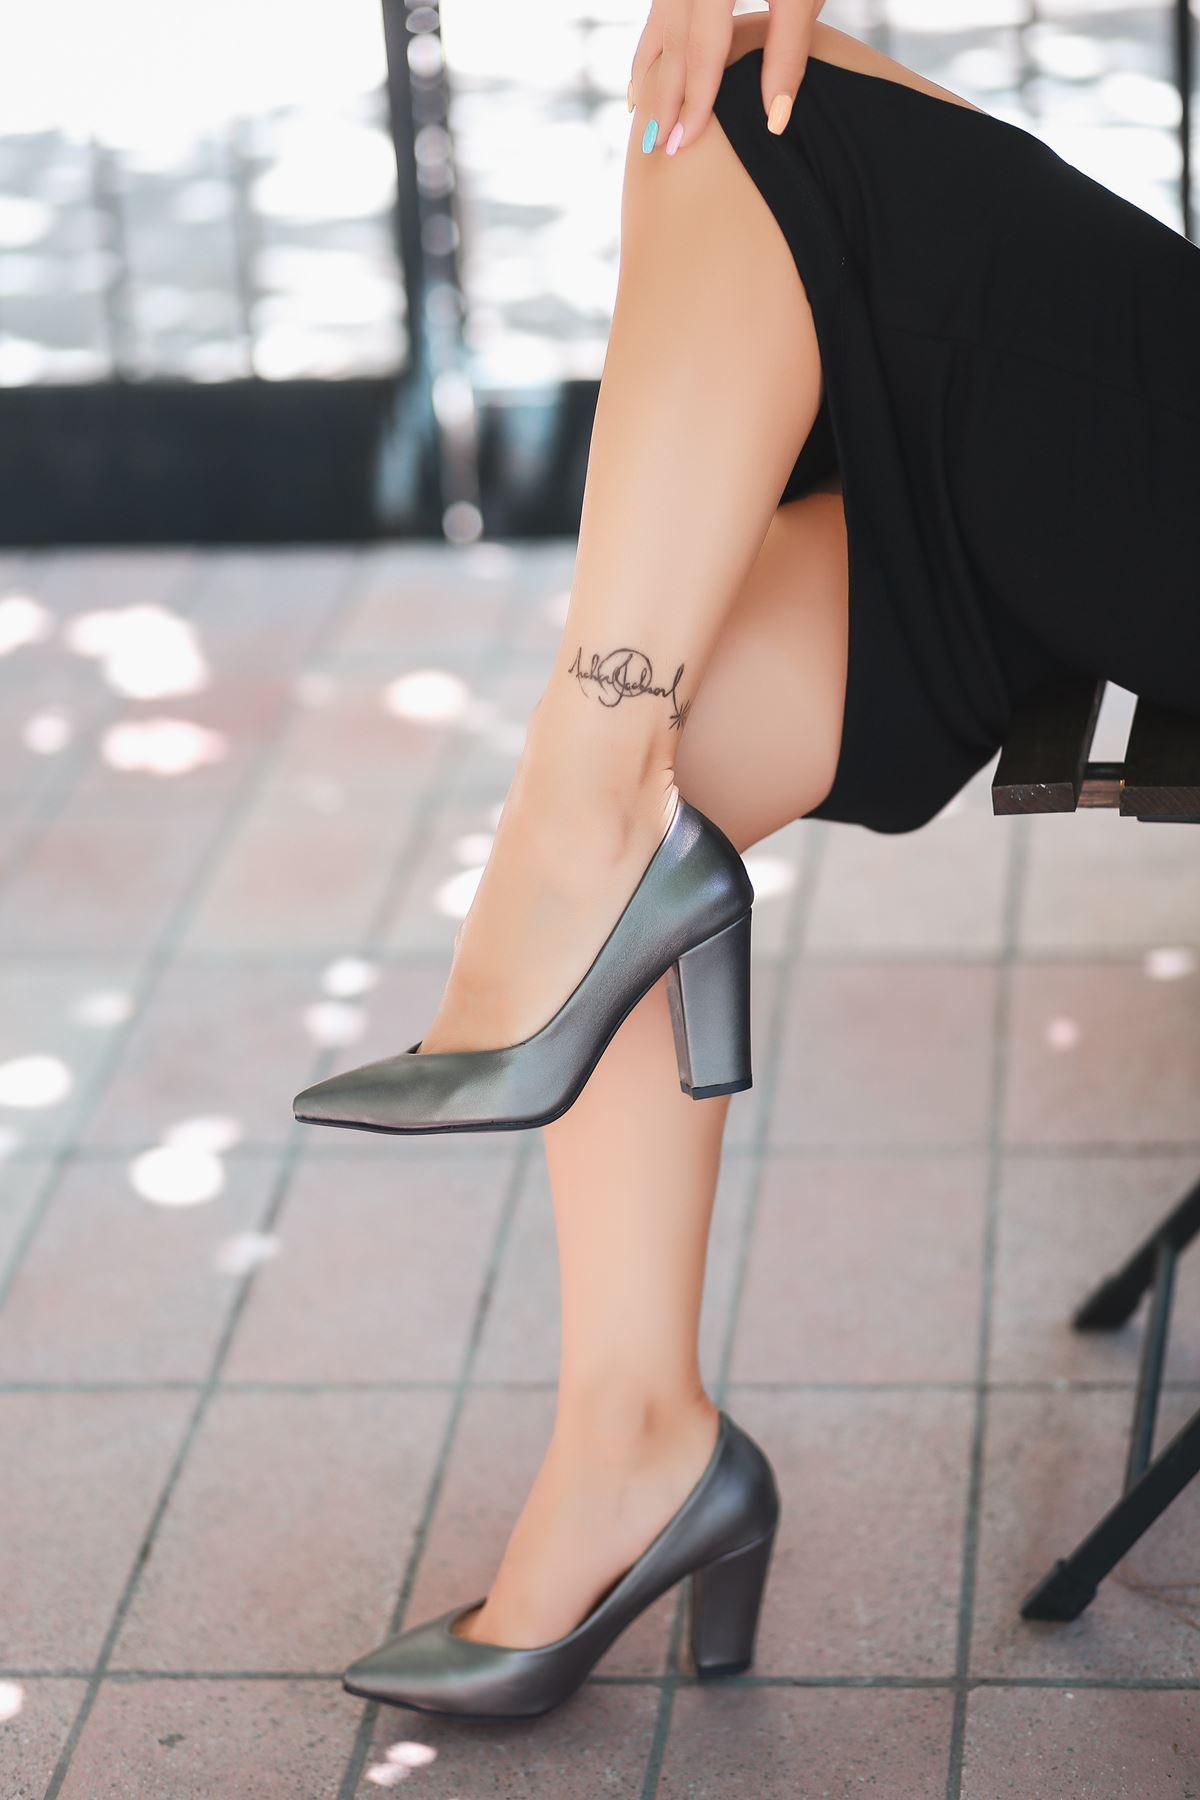 Odix Gri Cilt Topuklu Ayakkabı